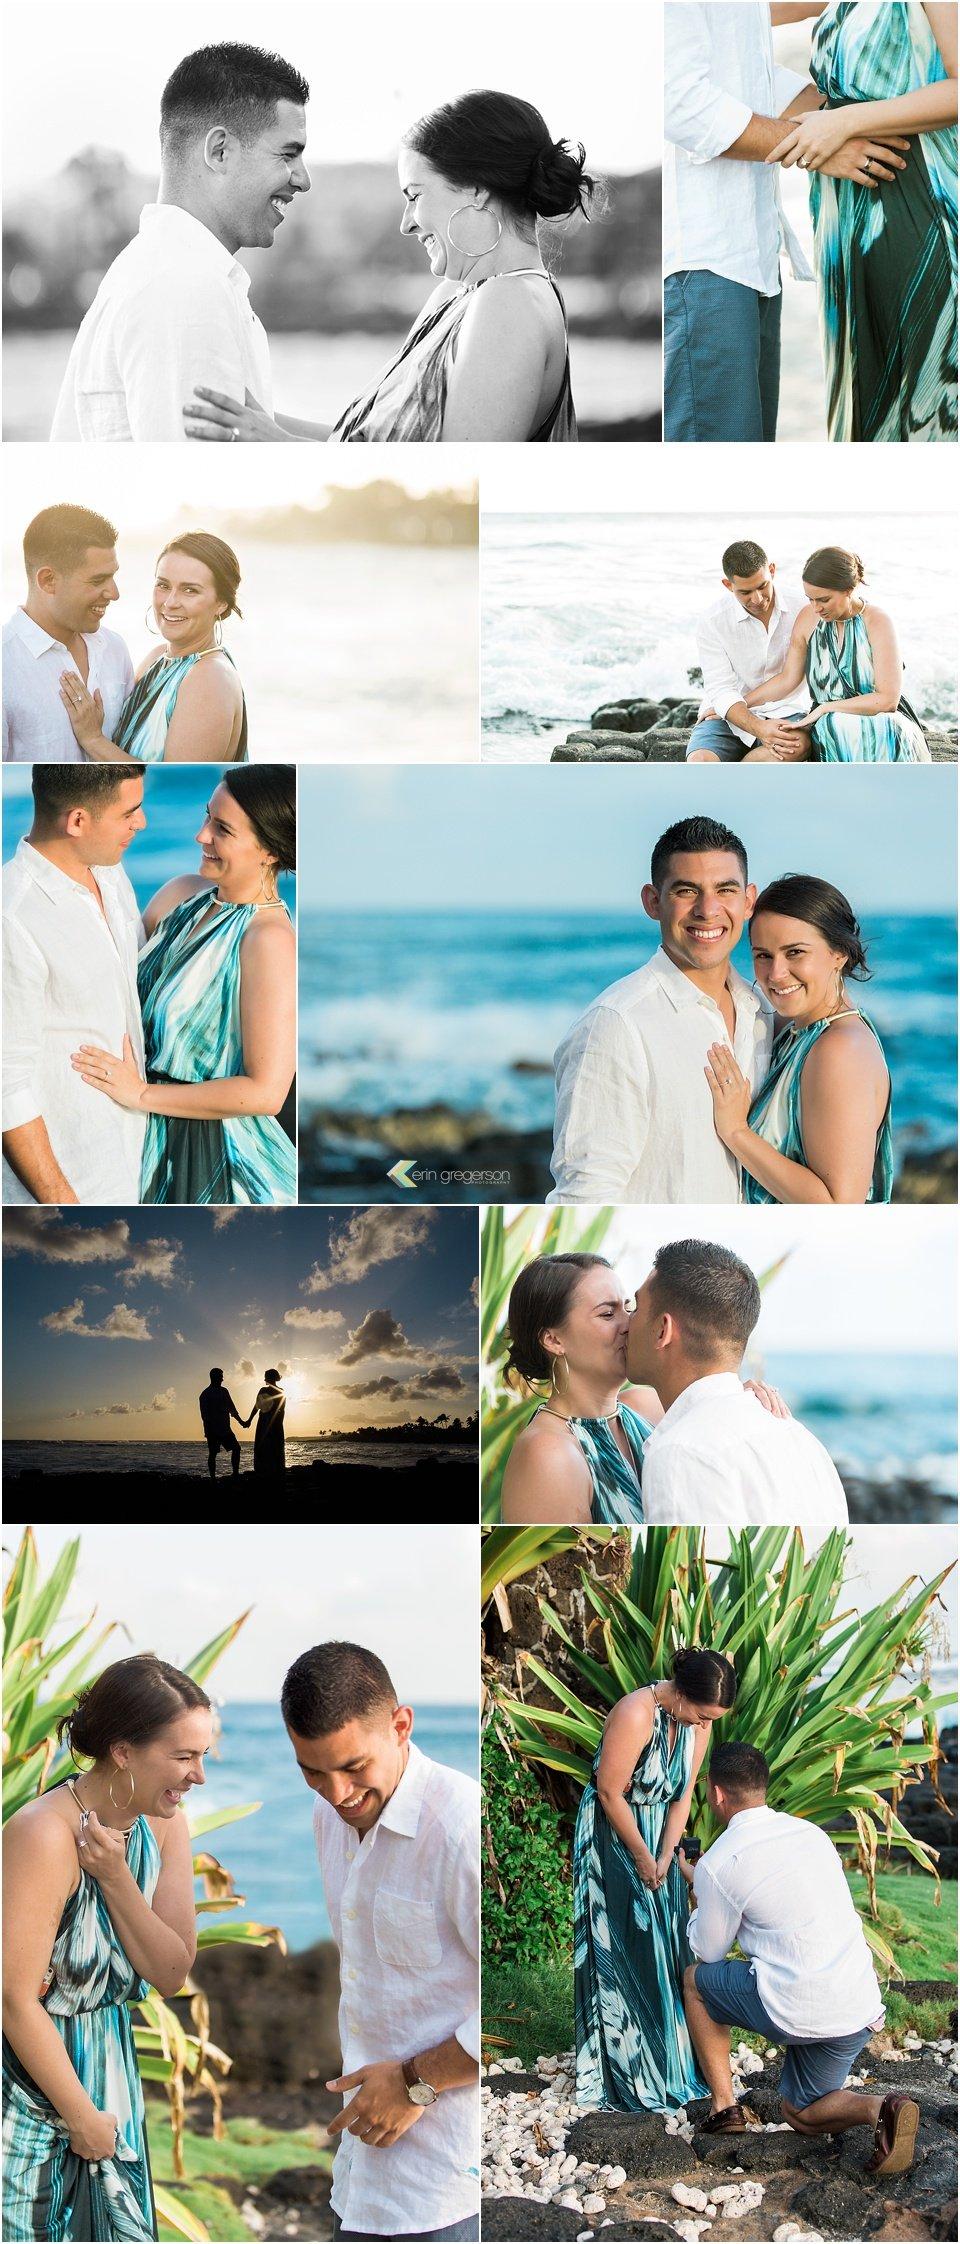 Kauai surprise proposal photo session